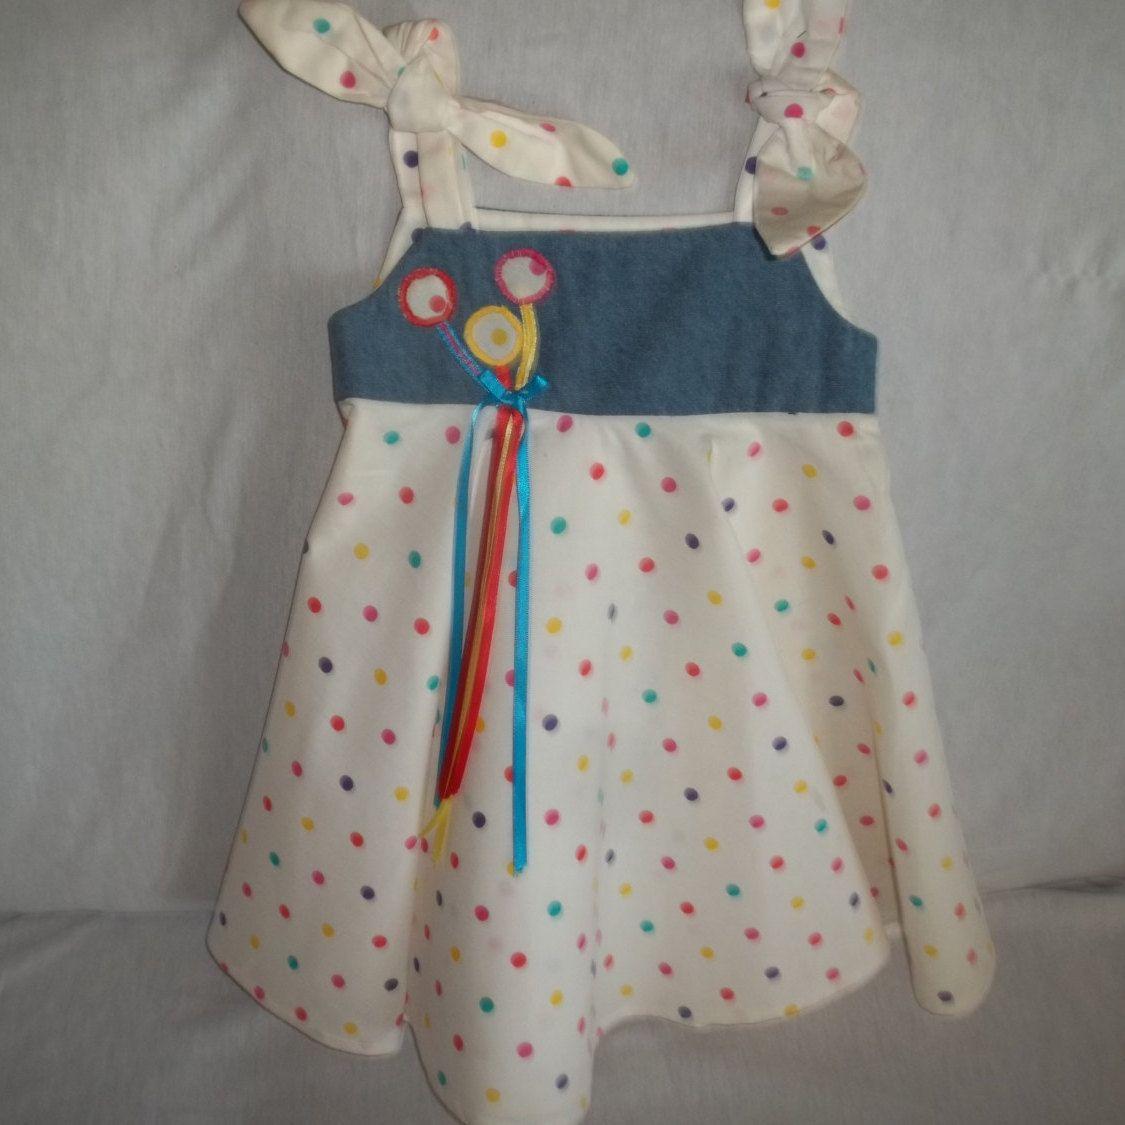 Size 3t Summer Dress Kids Outfits Summer Dresses Trending Outfits [ 1125 x 1125 Pixel ]